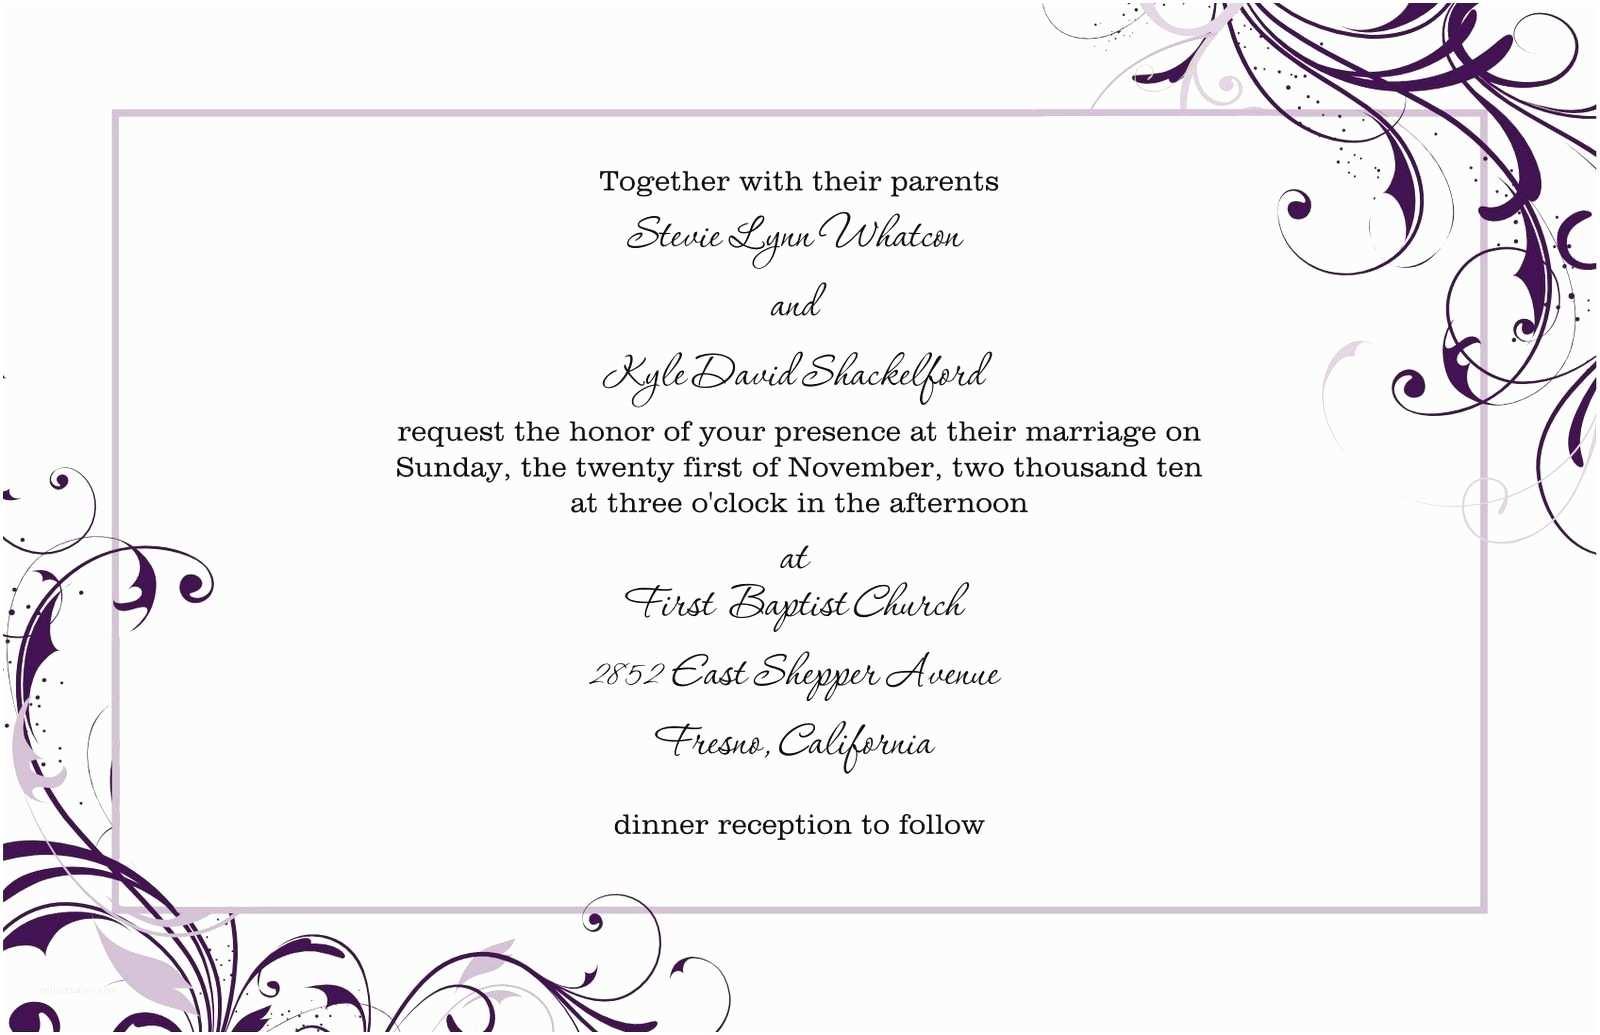 Free Wedding Invitation Templates for Word Free Wedding Invitation Templates for Word